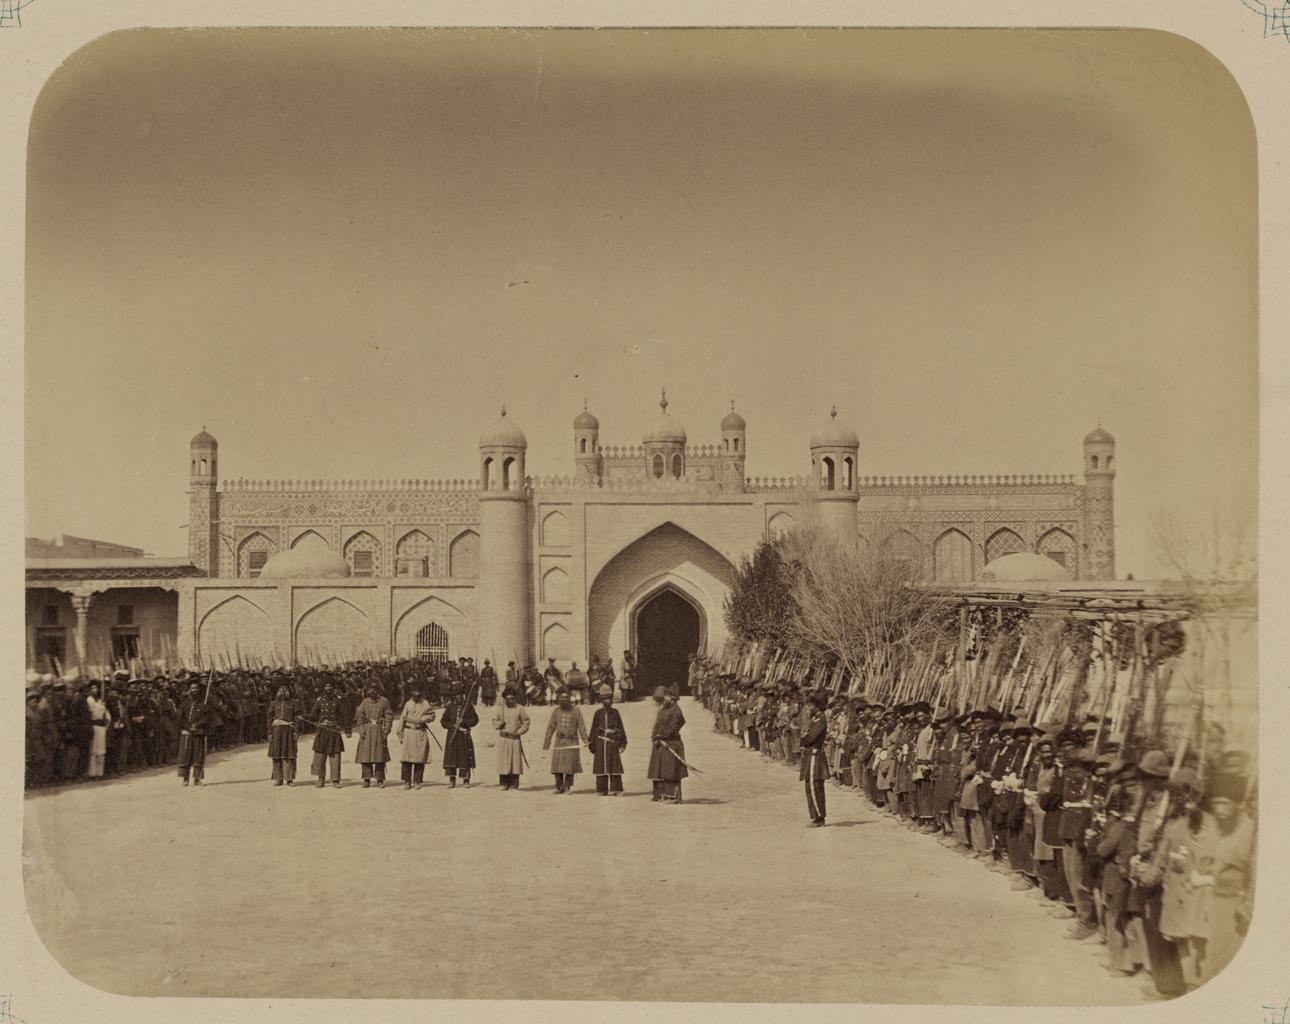 Ворота ханского дворца. Солдаты армии кокандского хана стоят во внутреннем дворе дворца